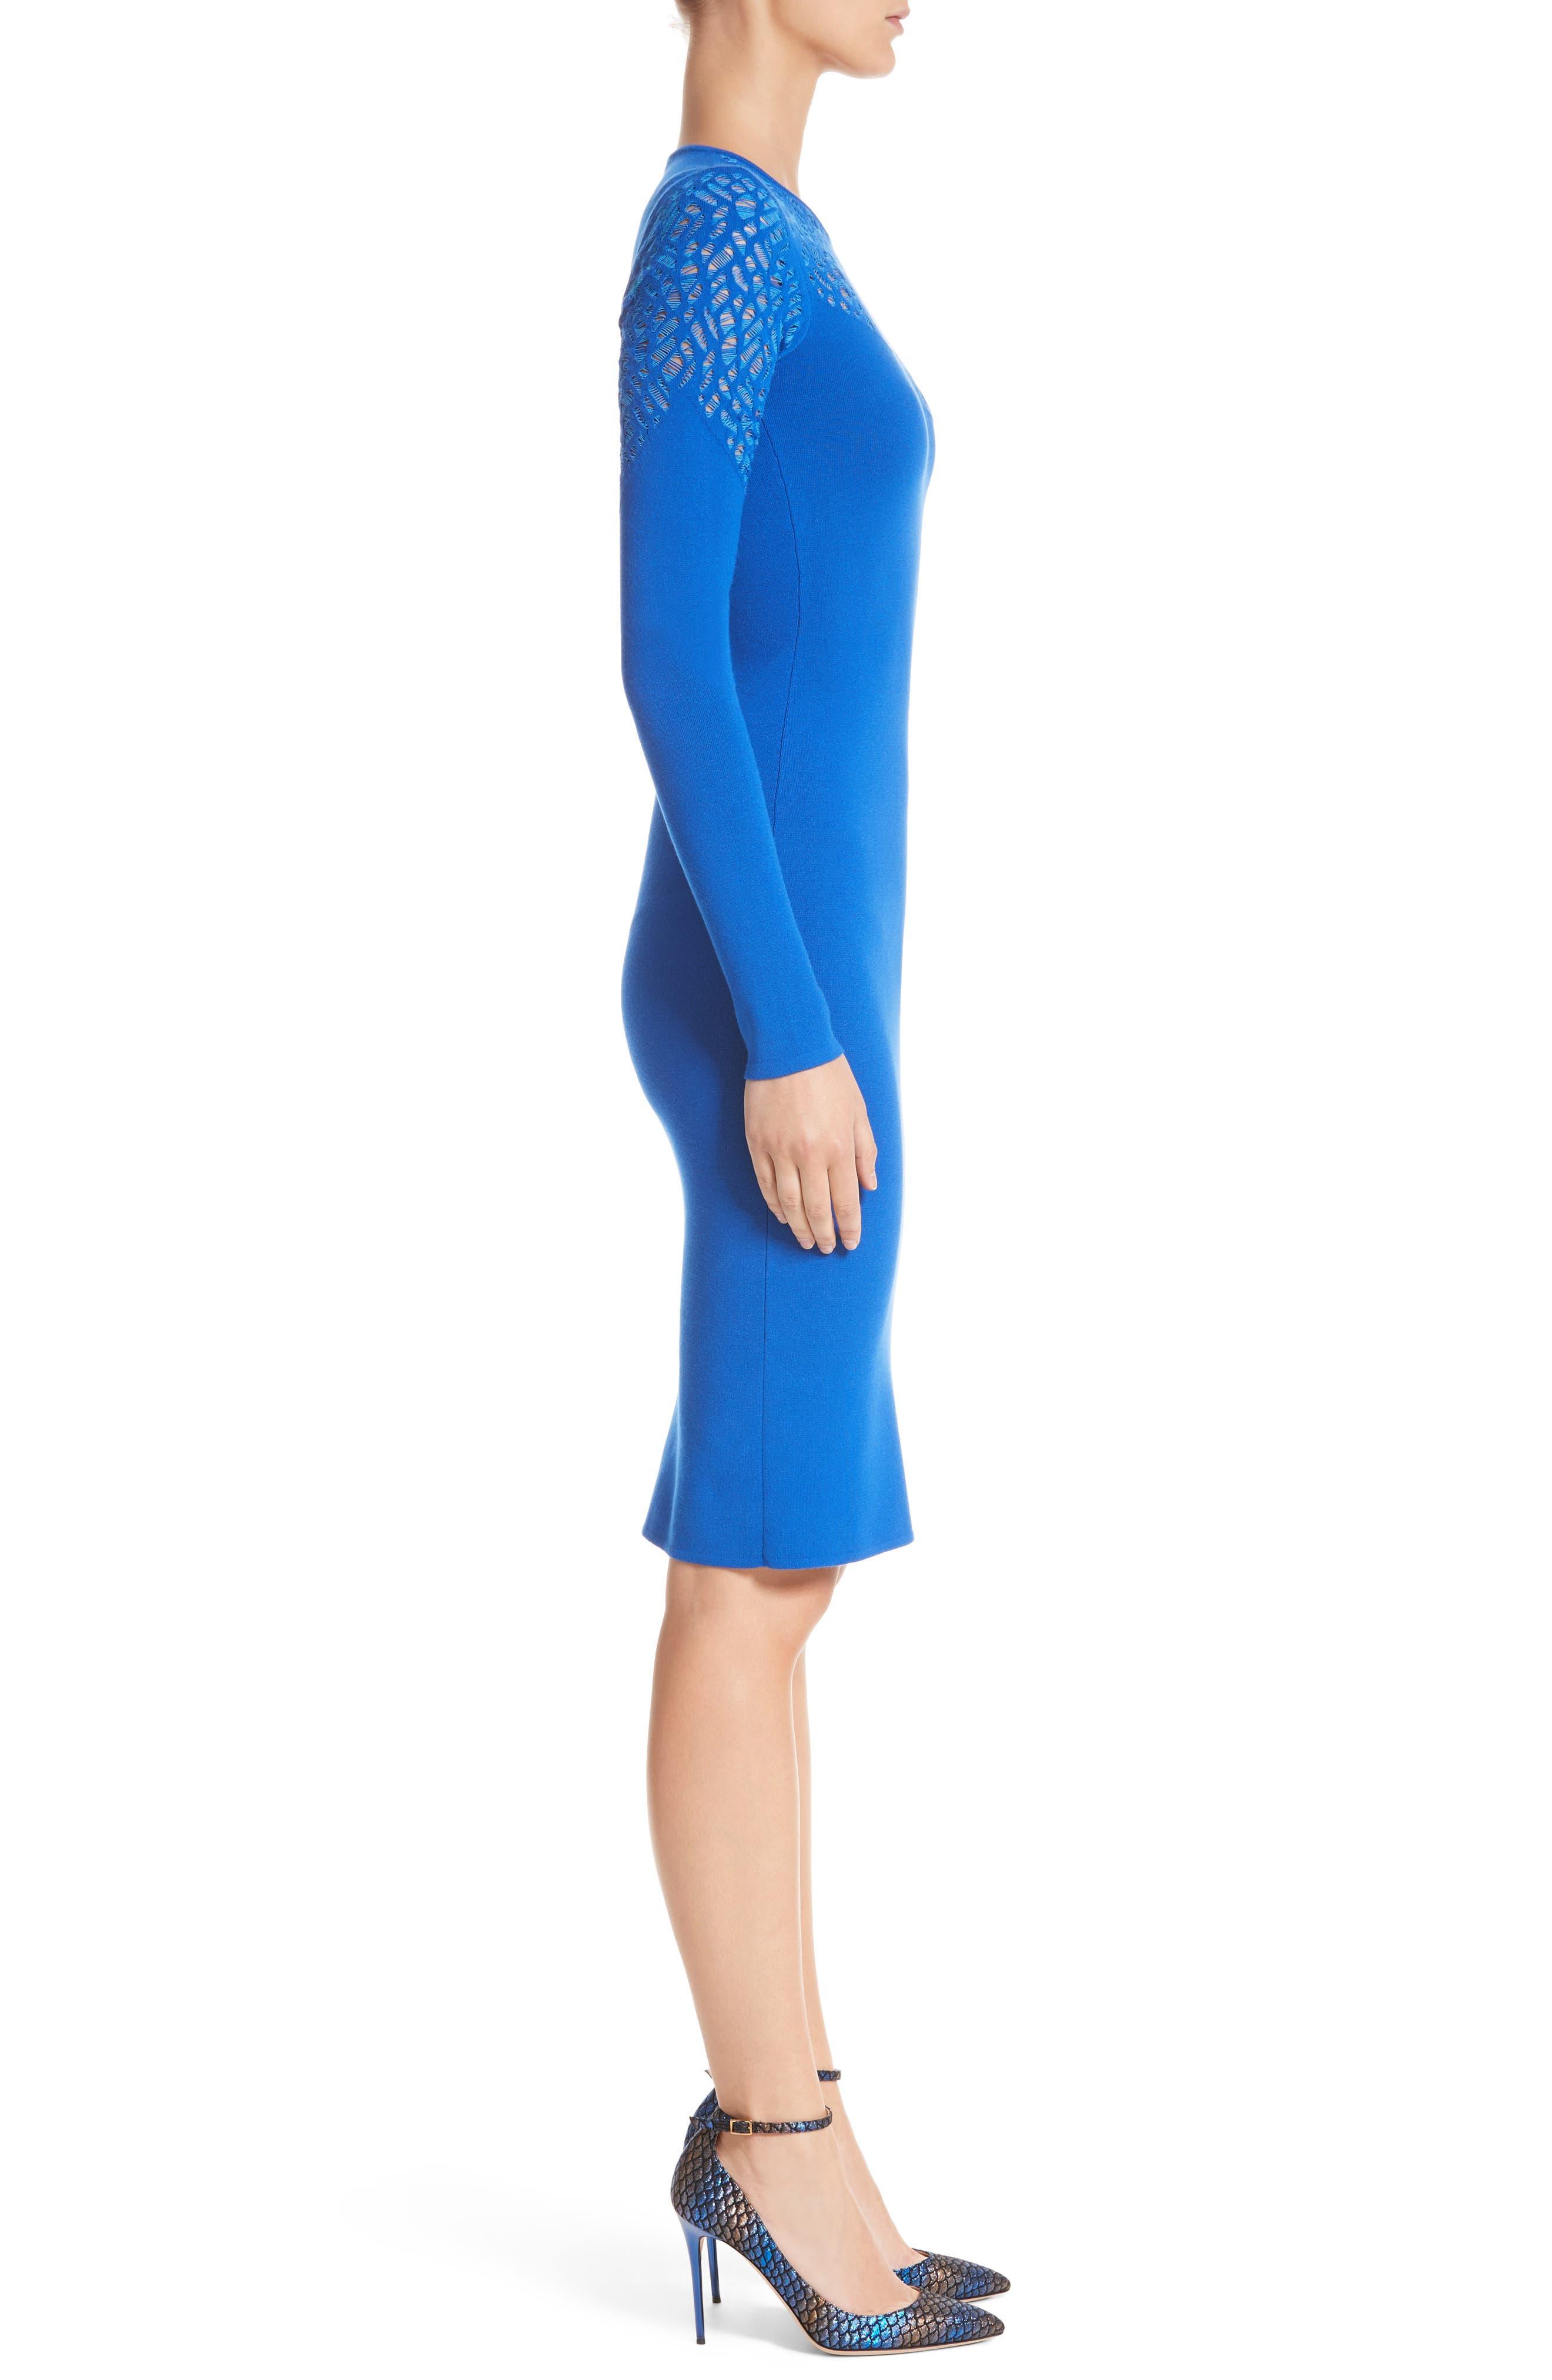 Contrast Stitch Knit Dress,                             Alternate thumbnail 3, color,                             Royal Blue/ Light Blue